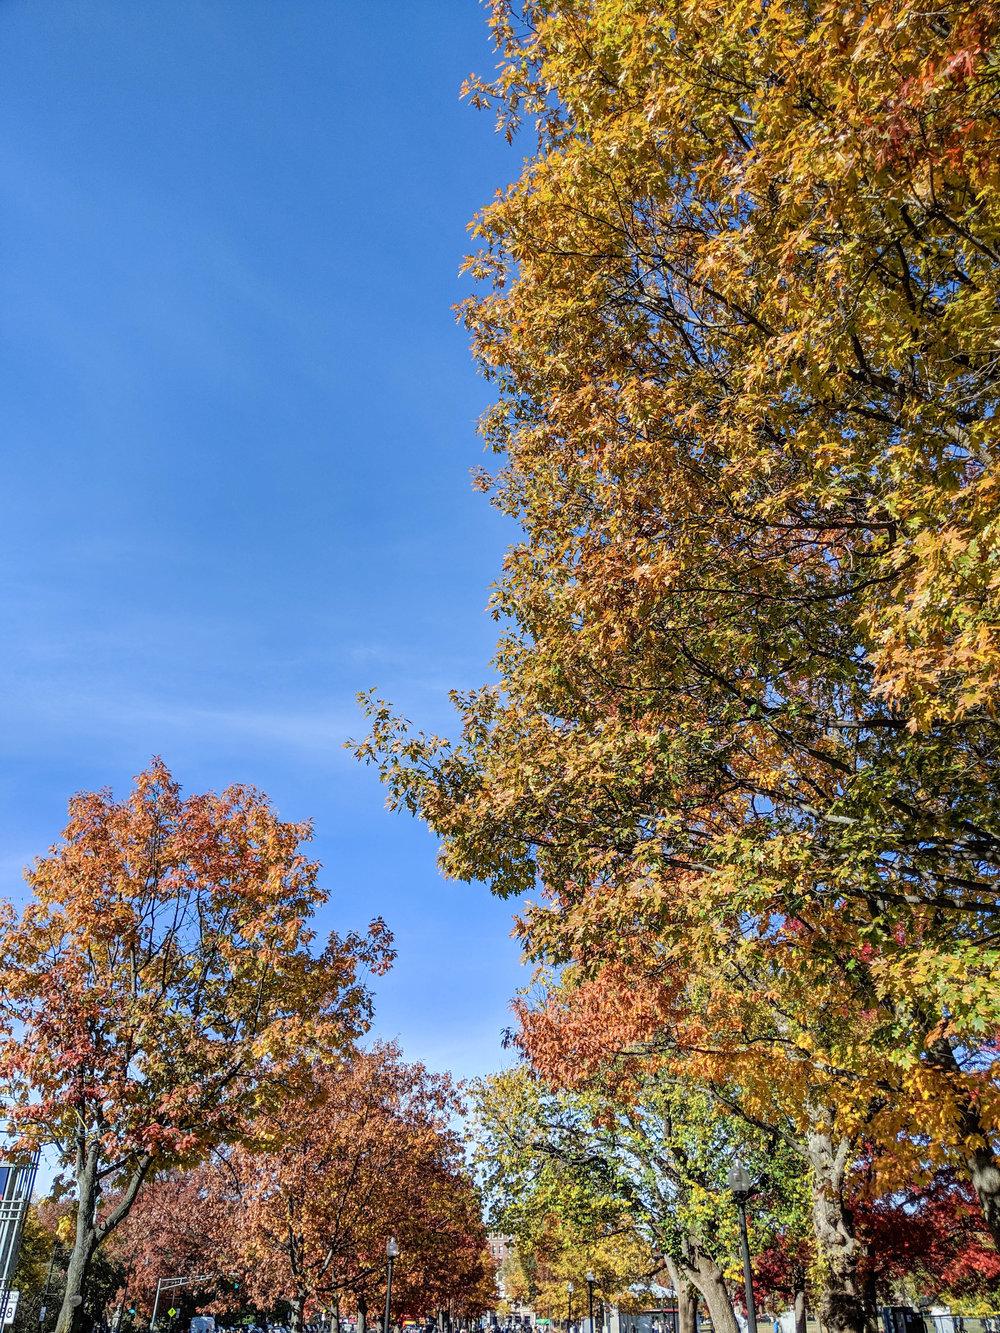 bri rinehart; photography; boston commons; fall; nature